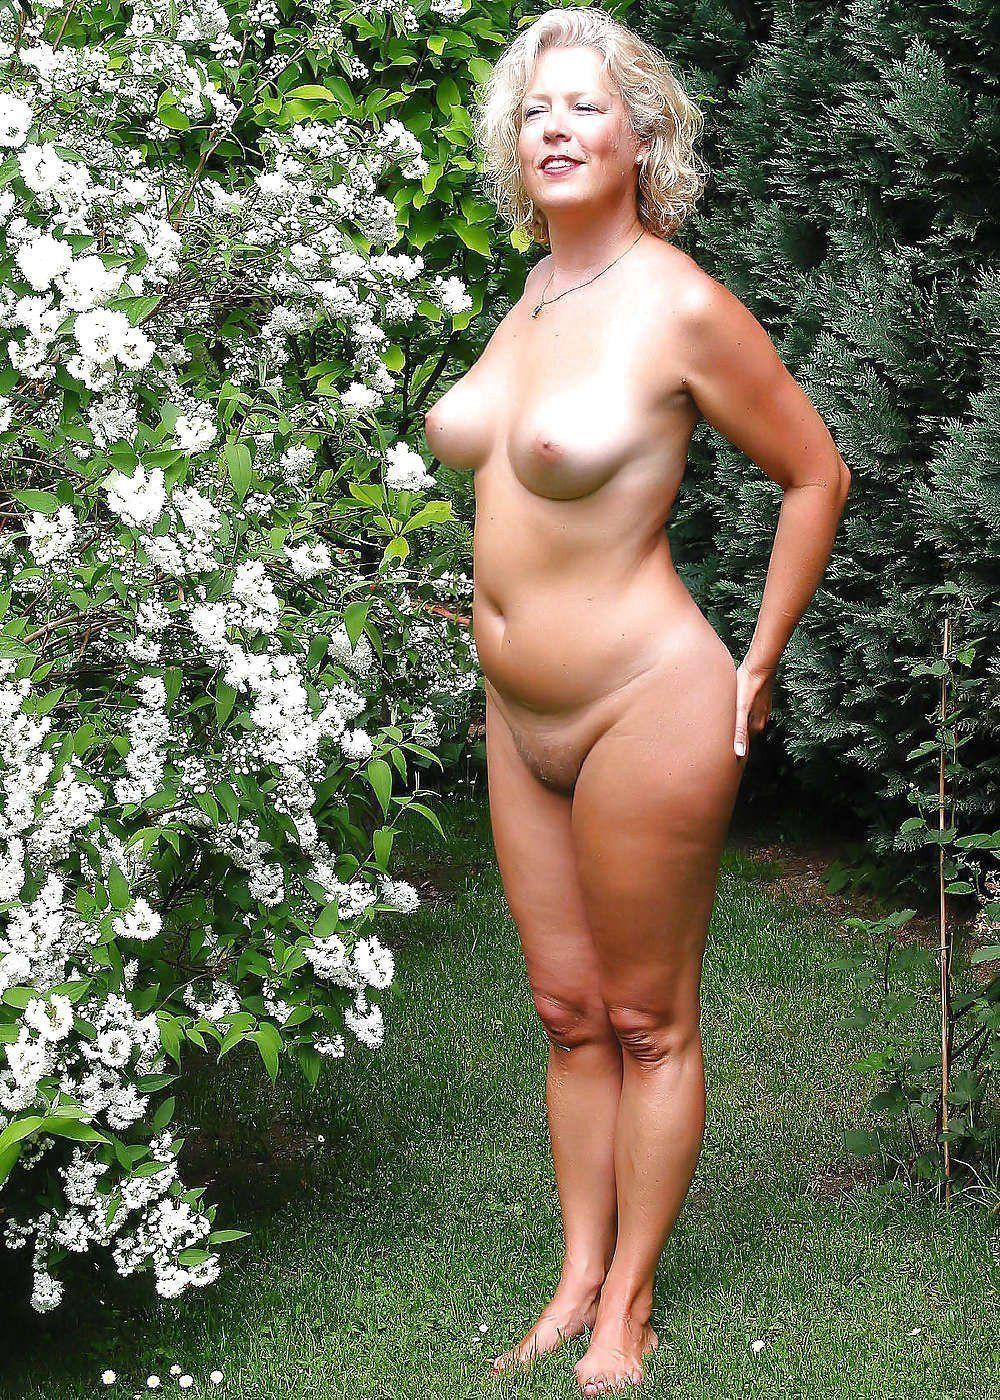 Sauth indian girl nude